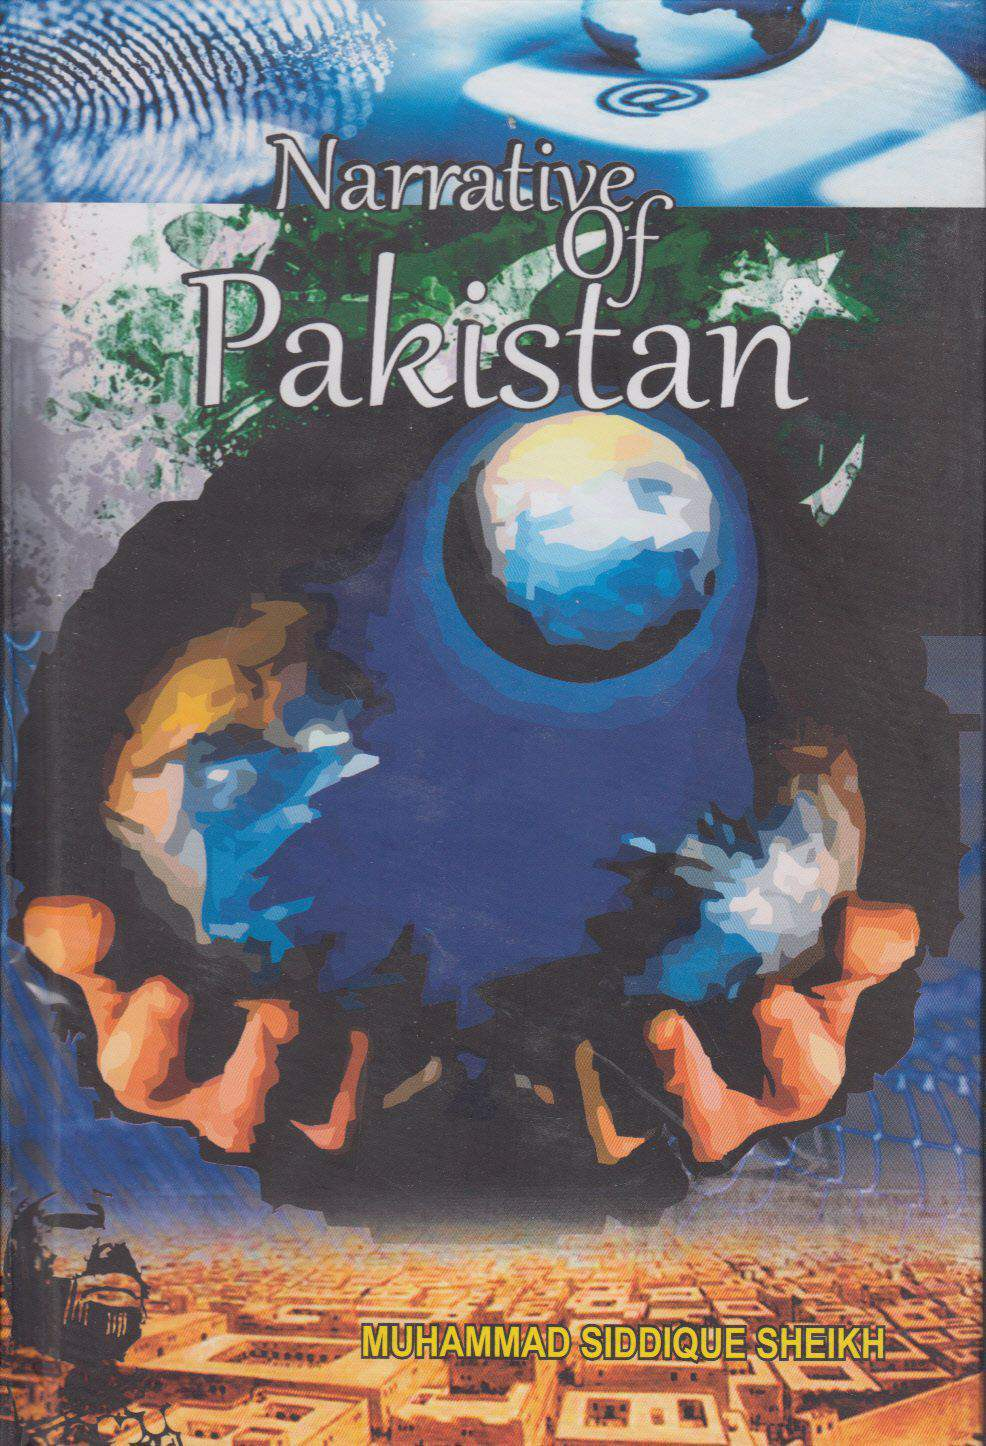 Narrative of Pakistan